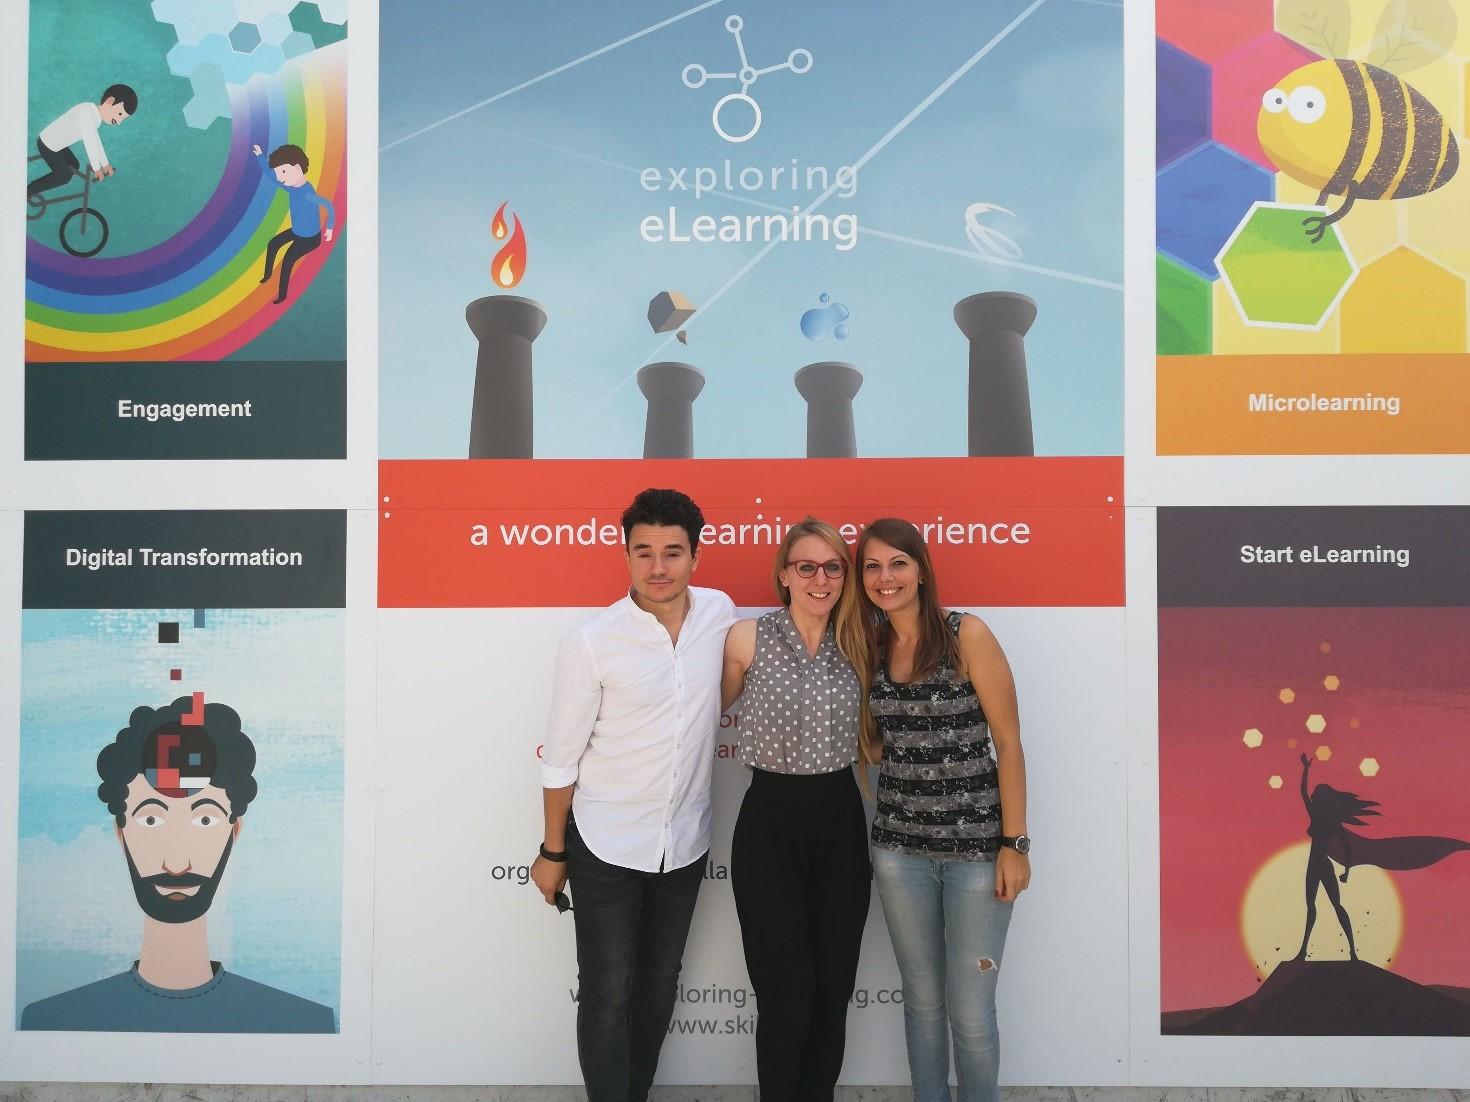 Formazione: Training @Exploring eLearning